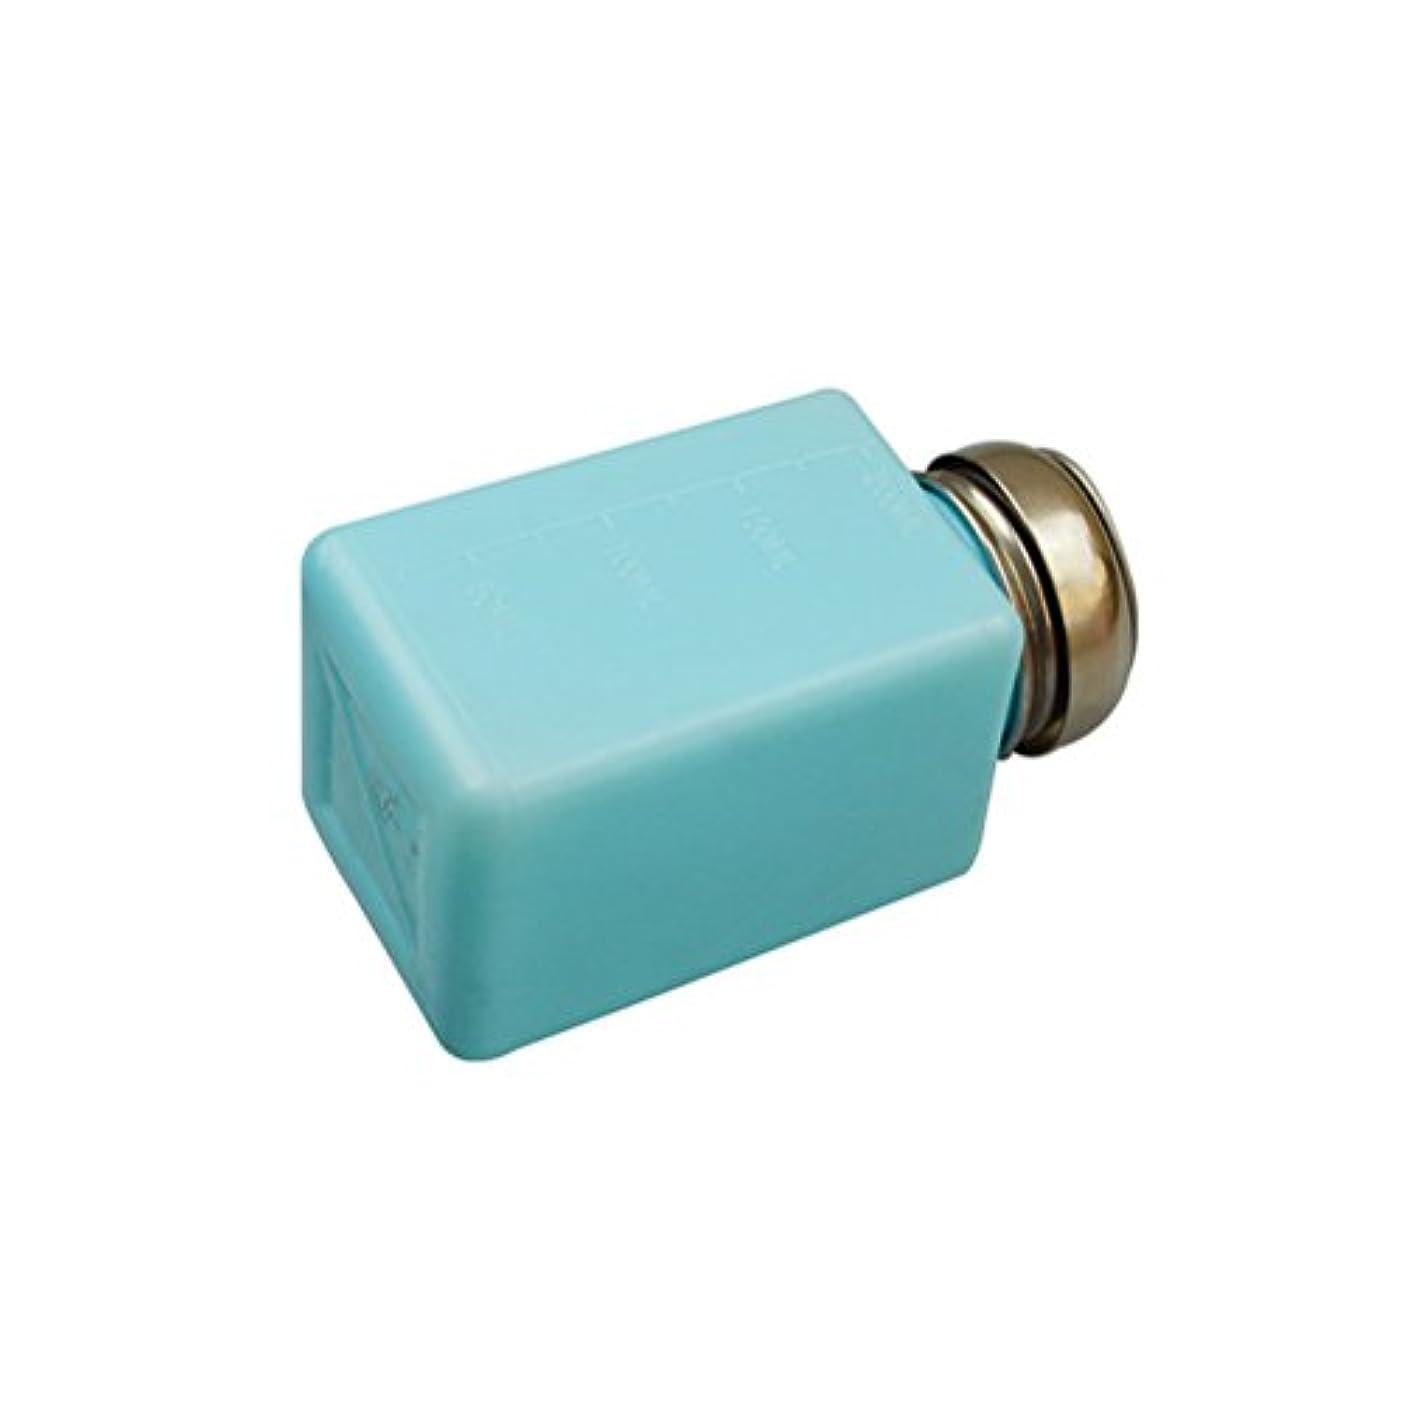 BESTOMZ アルコールボトル 便利 クレンジングオイル 小分け容器 静電防止 200ML(青)